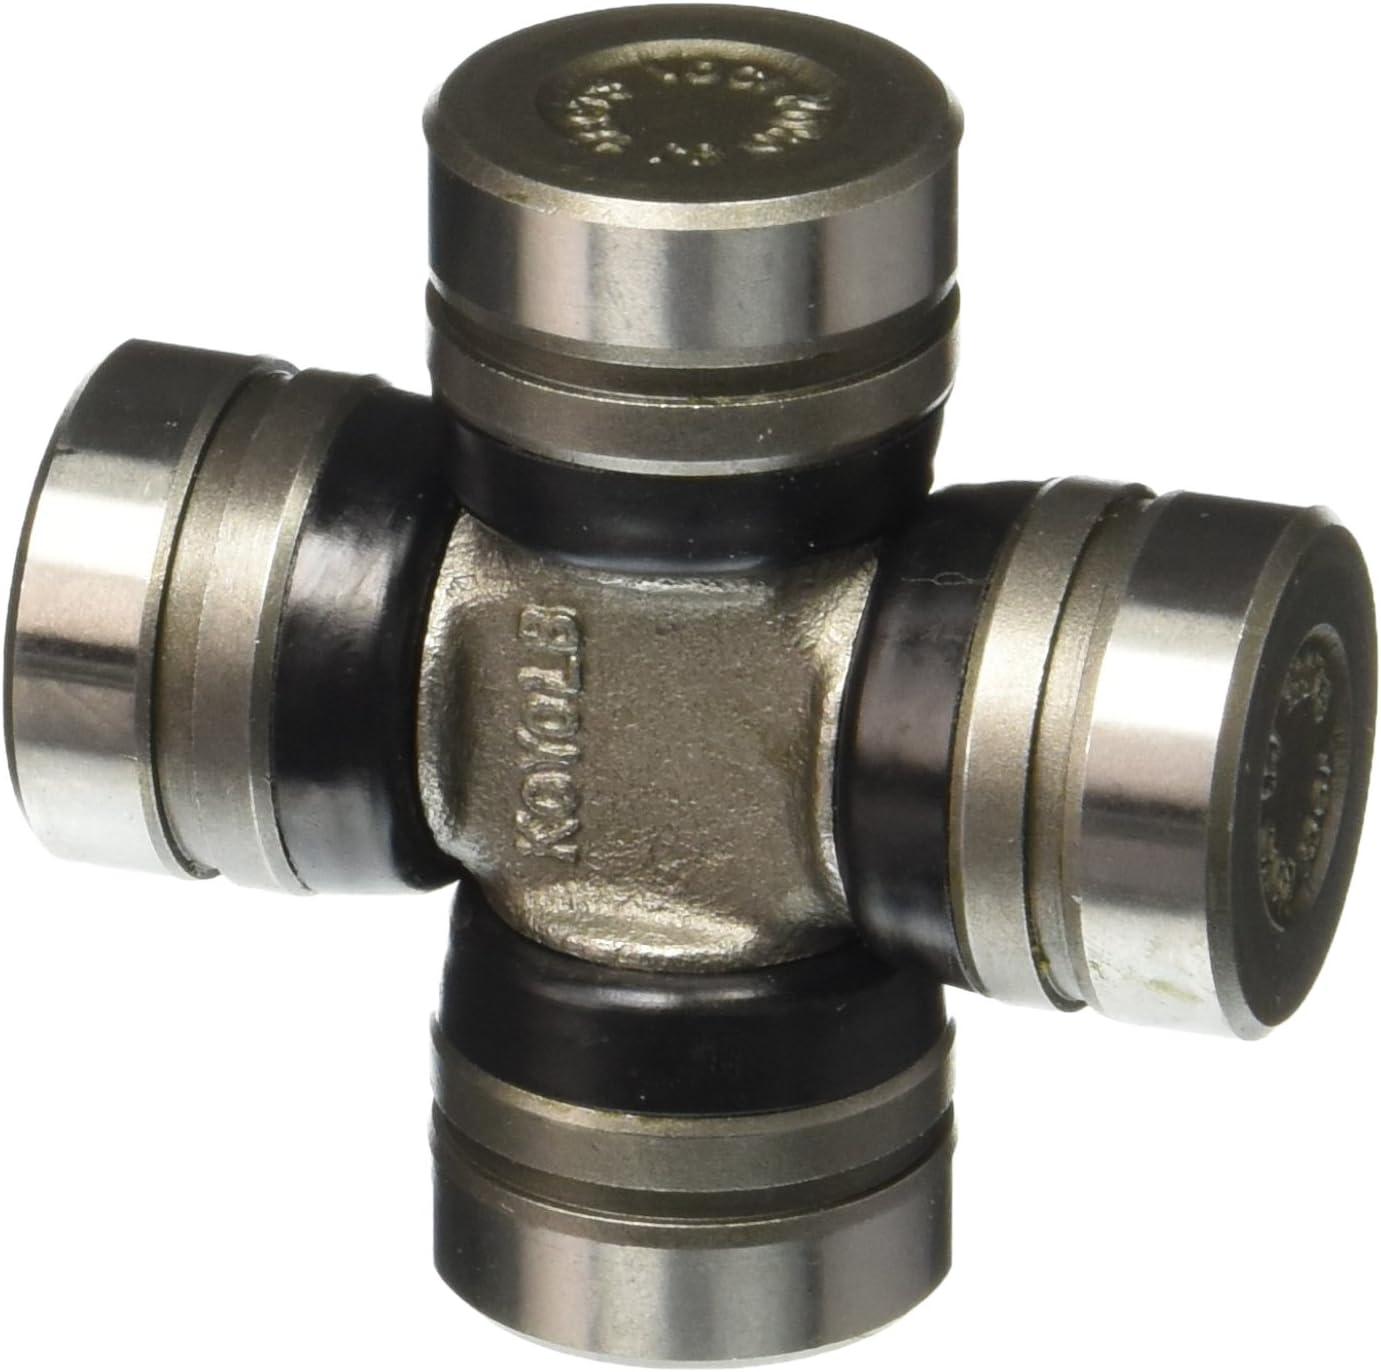 All Balls 19-1005 Universal Joint Kit For 1999 Polaris Scrambler 500 4x4